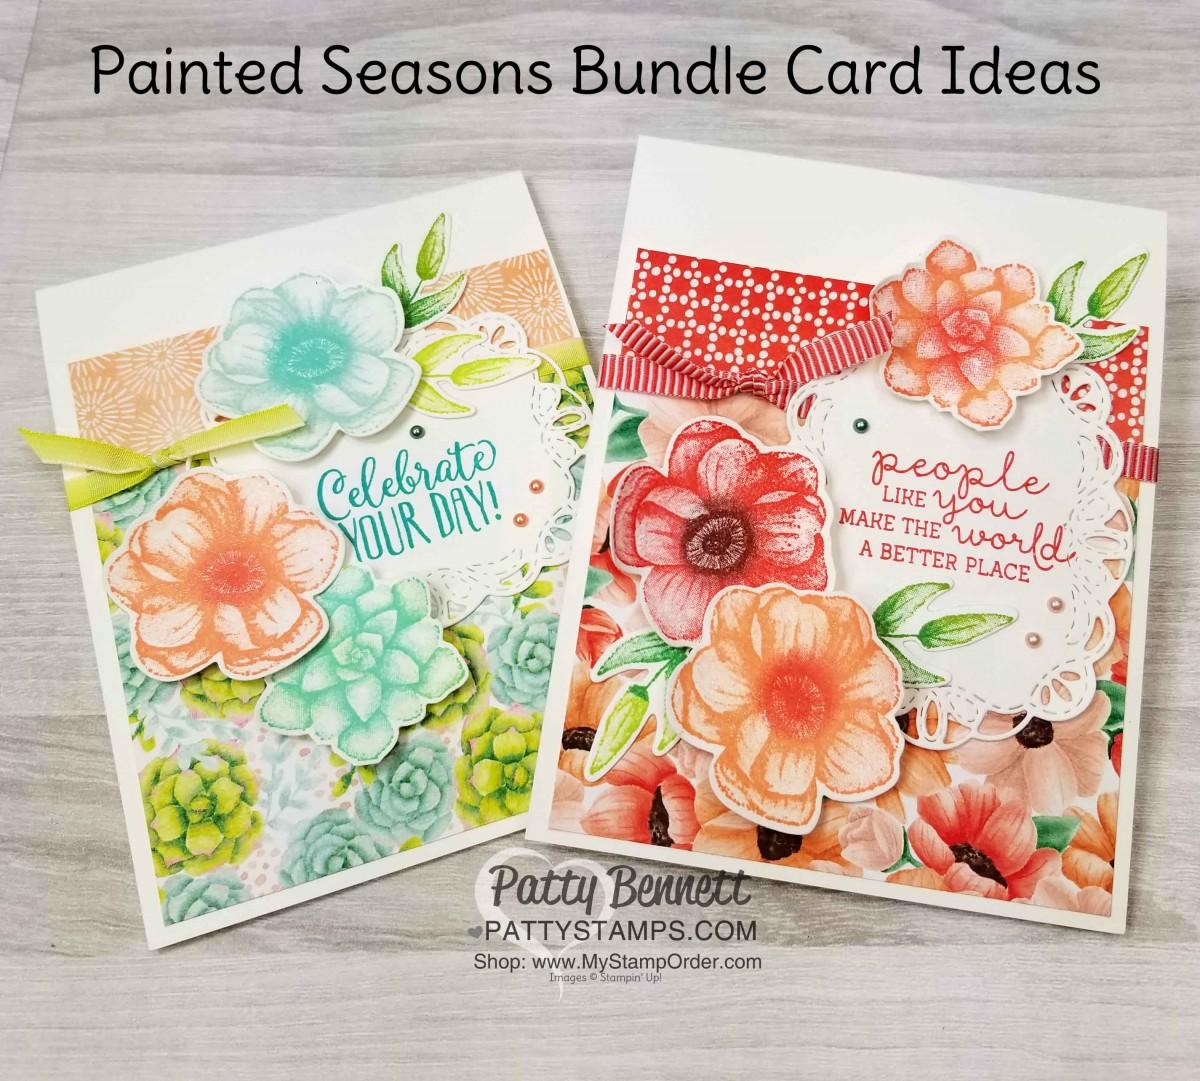 Painted Seasons Bundle card ideas